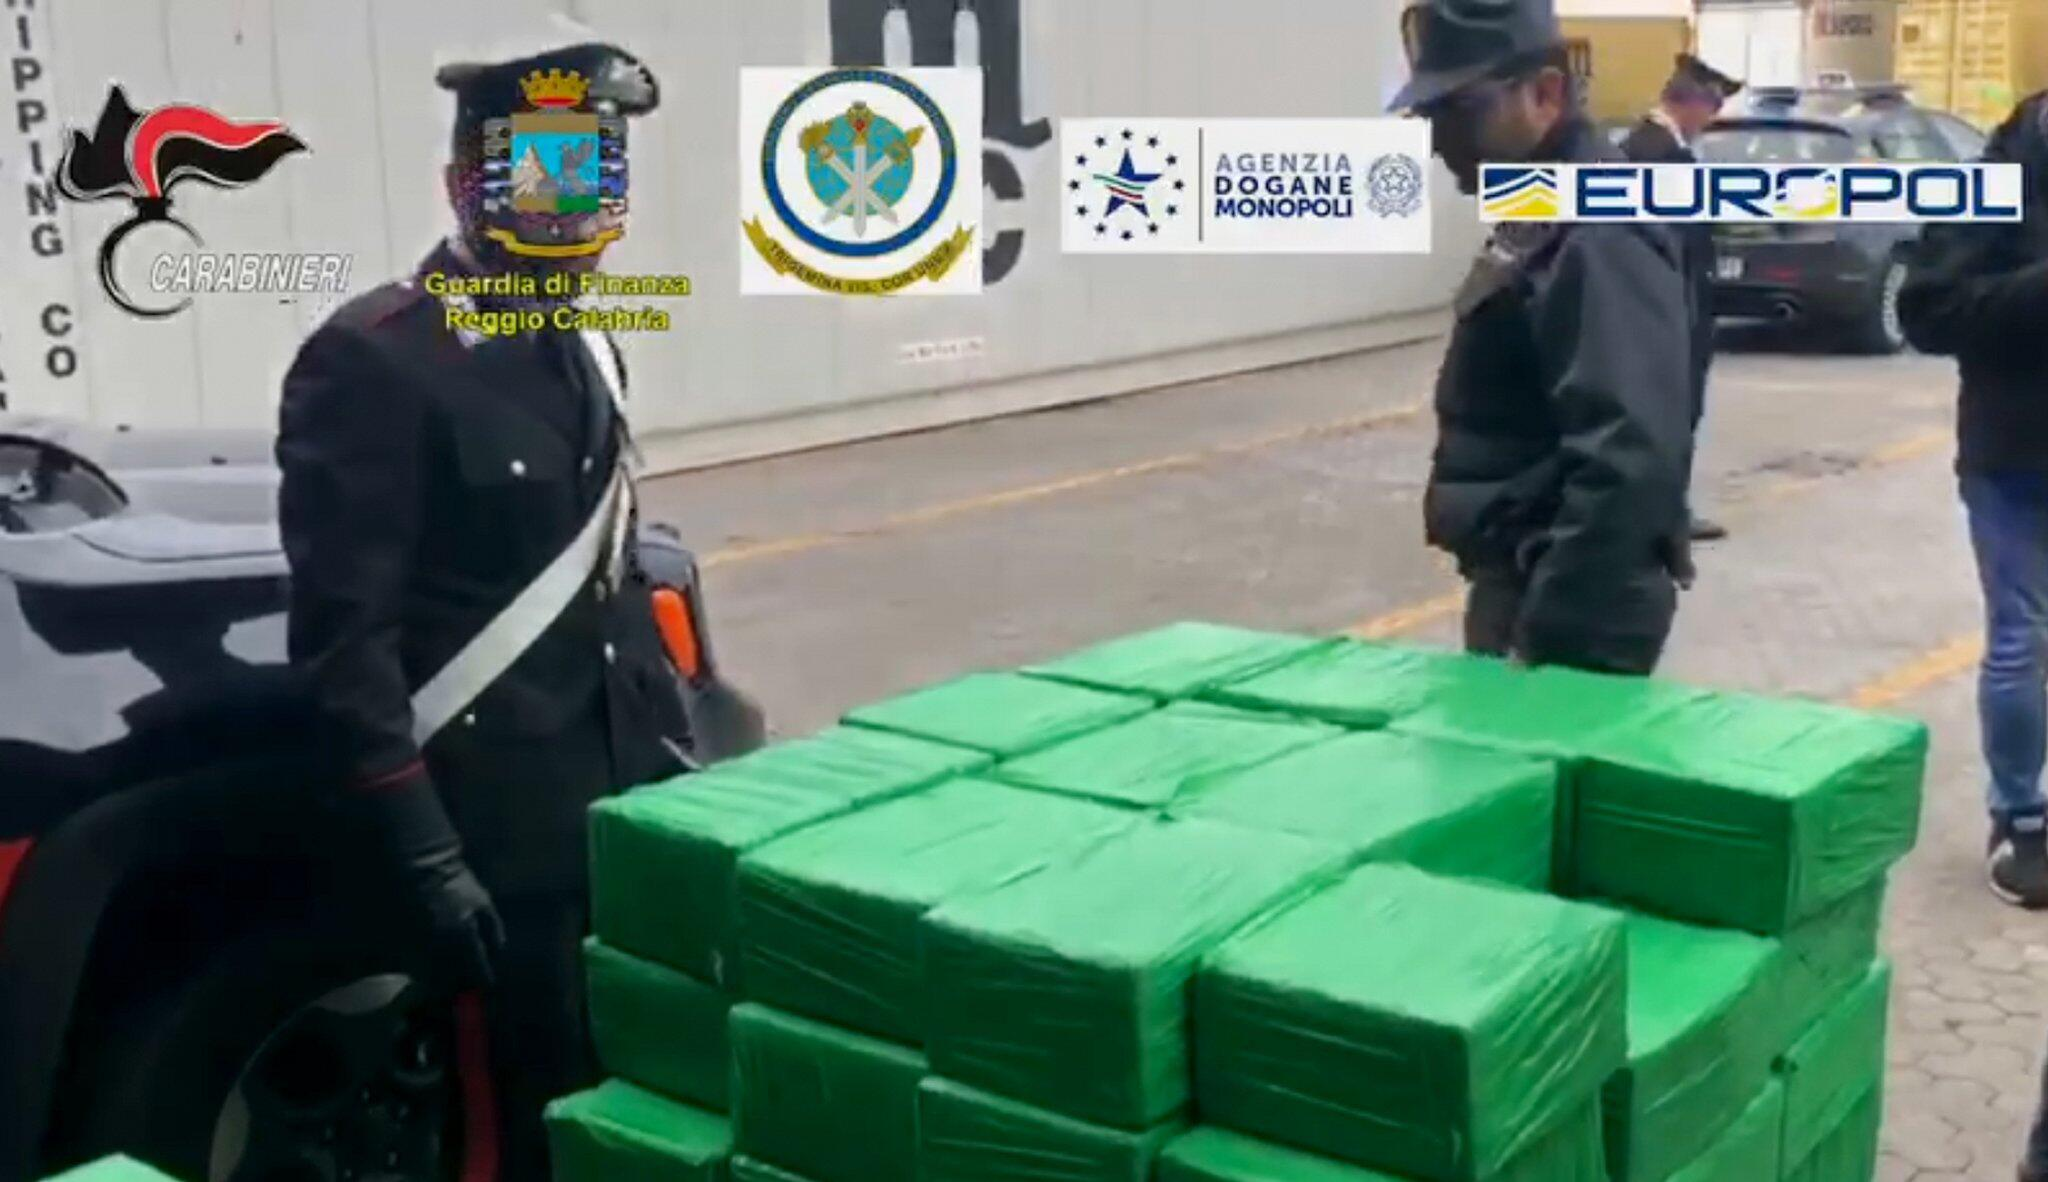 Bild zu Kokain-Fund in Bananenkisten in Italien